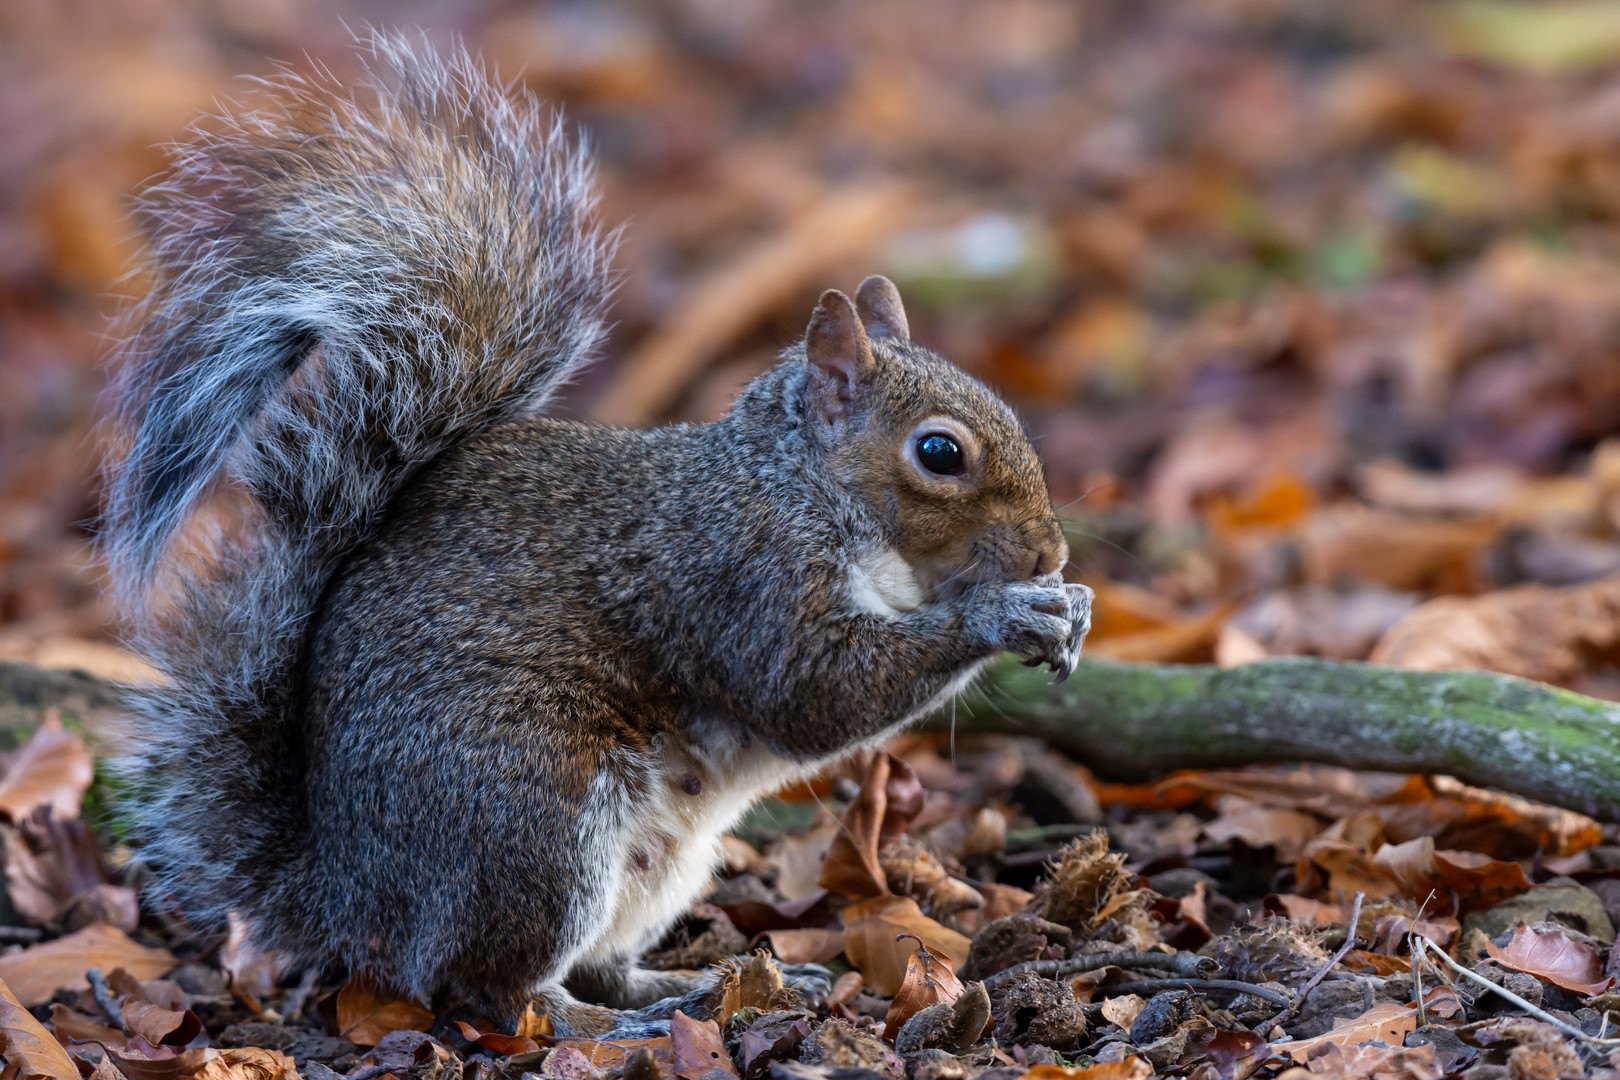 Brown Squirrel at Adel Dam Nature Reserve, Leeds, West Yorkshire